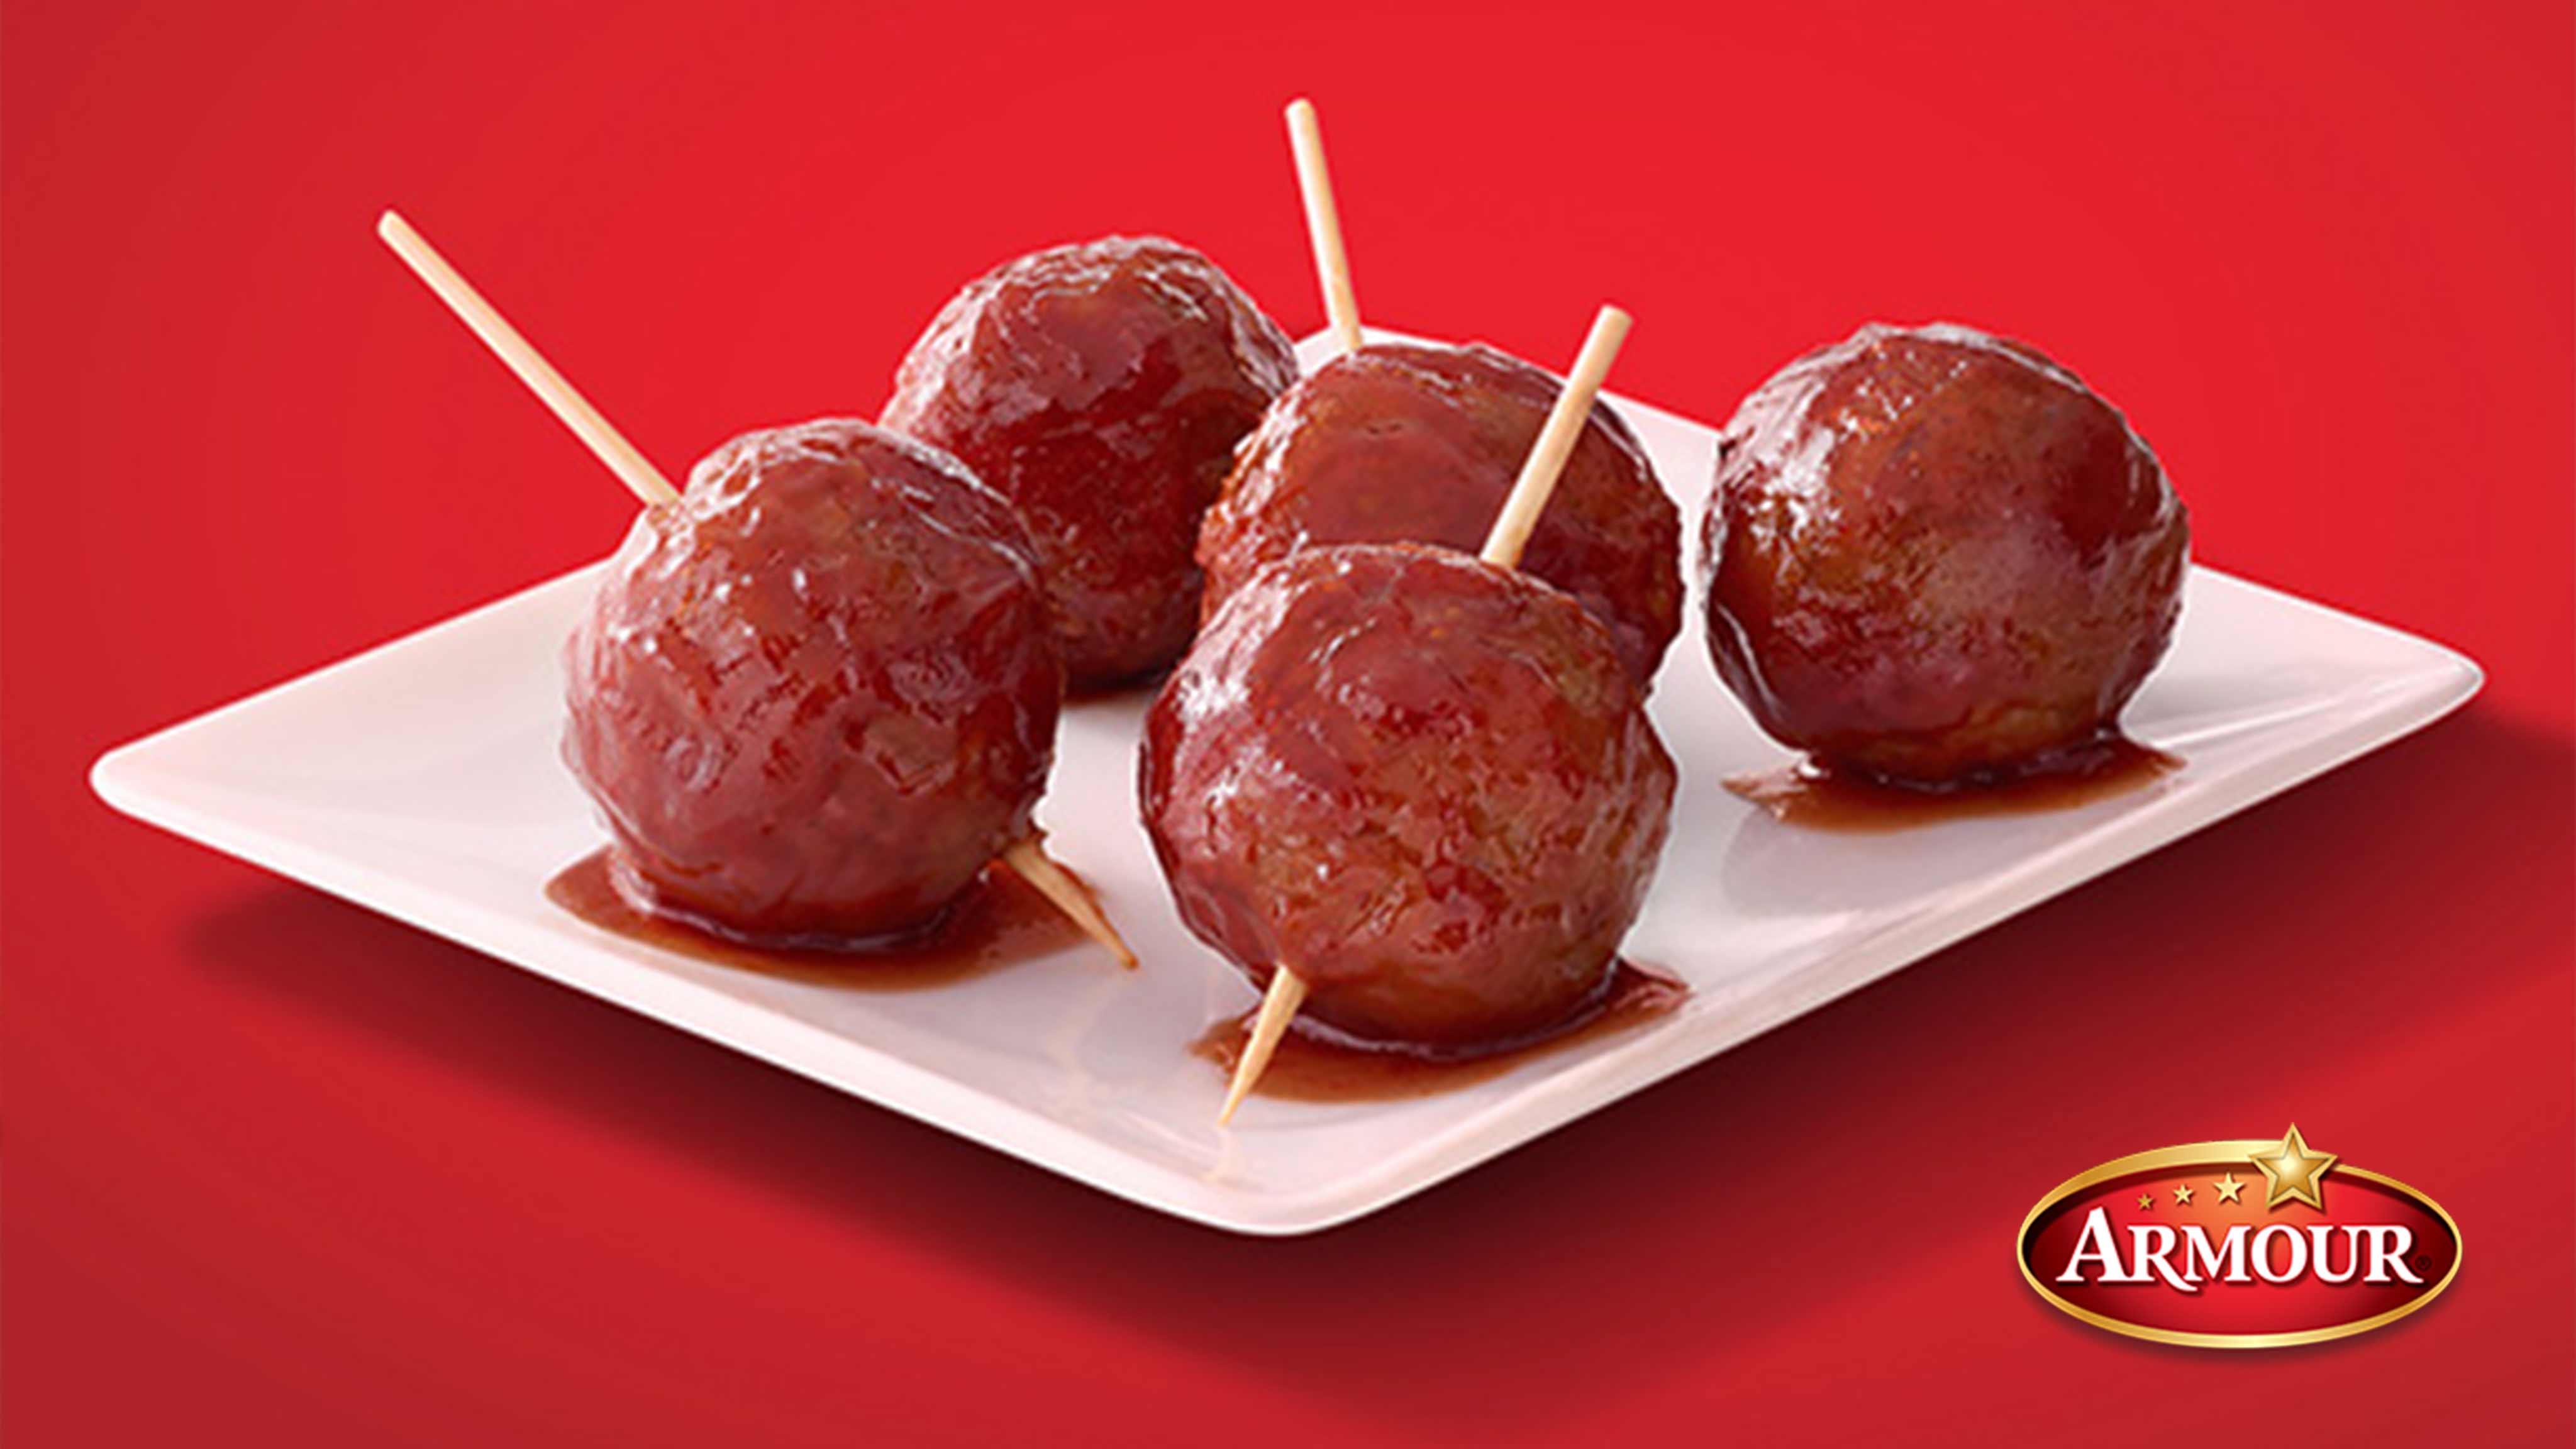 Image for Recipe Barbecue Glazed Meatballs